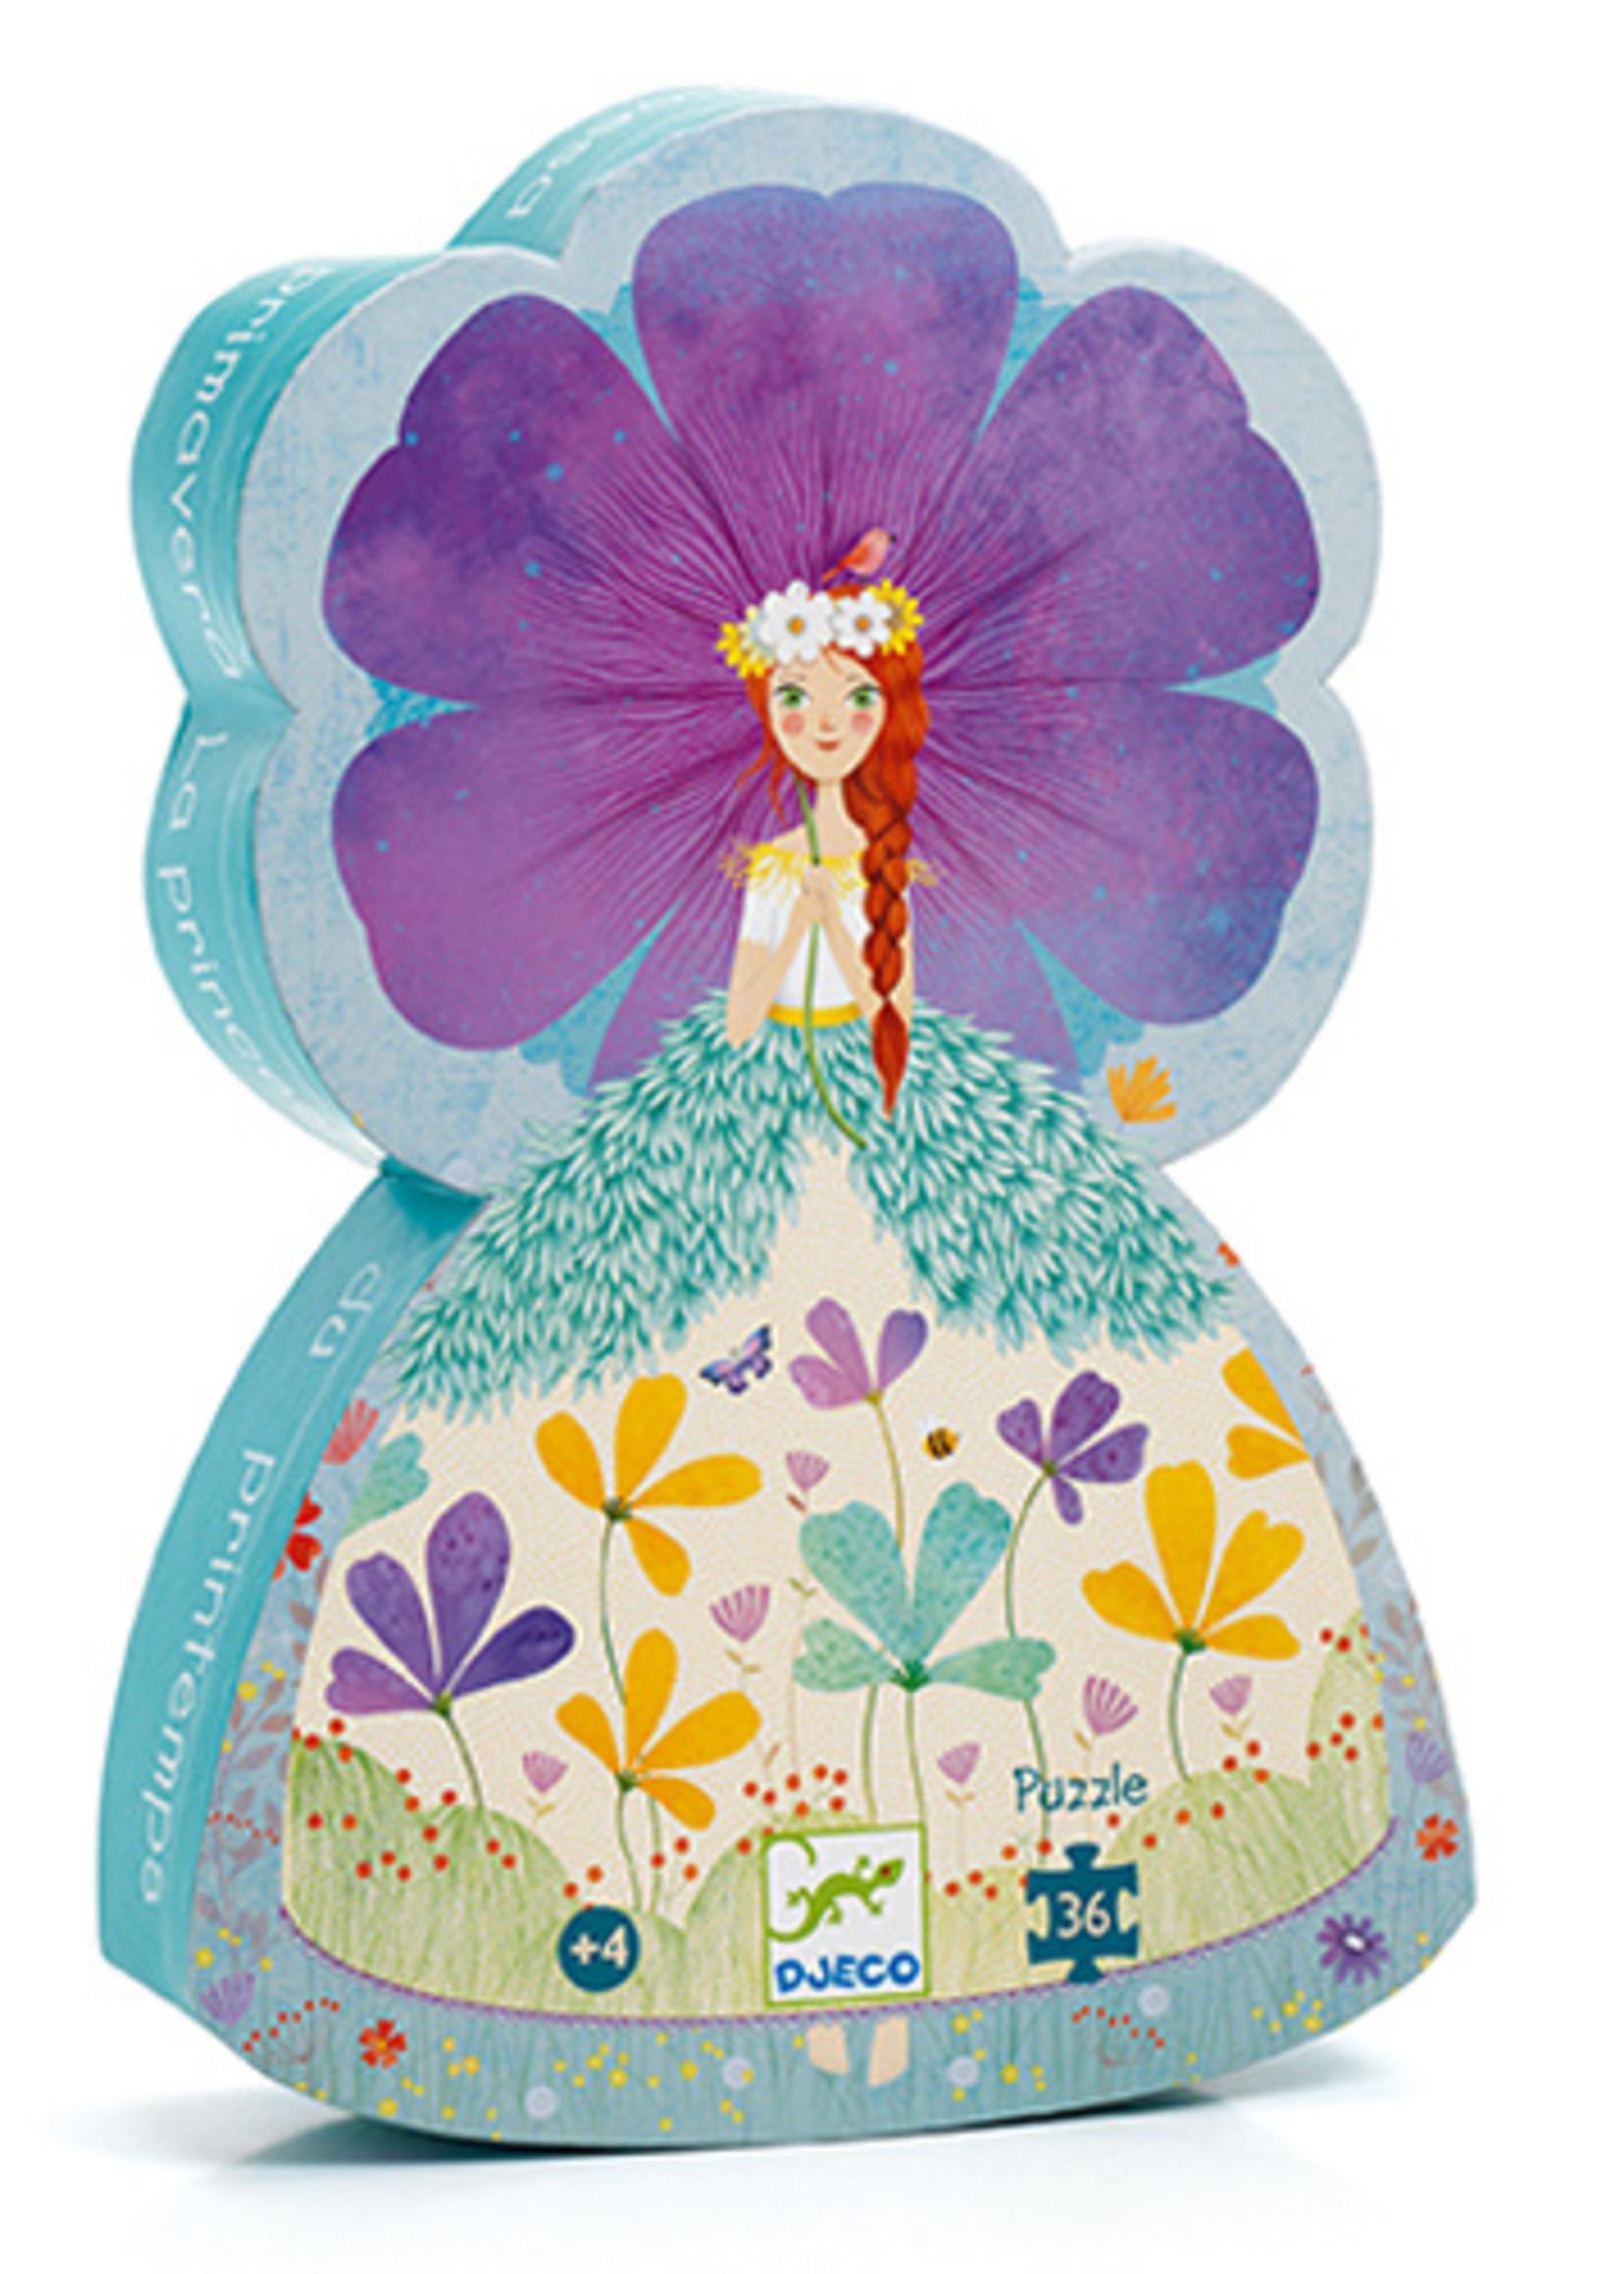 Djeco Casse-tête Princesse du printemps